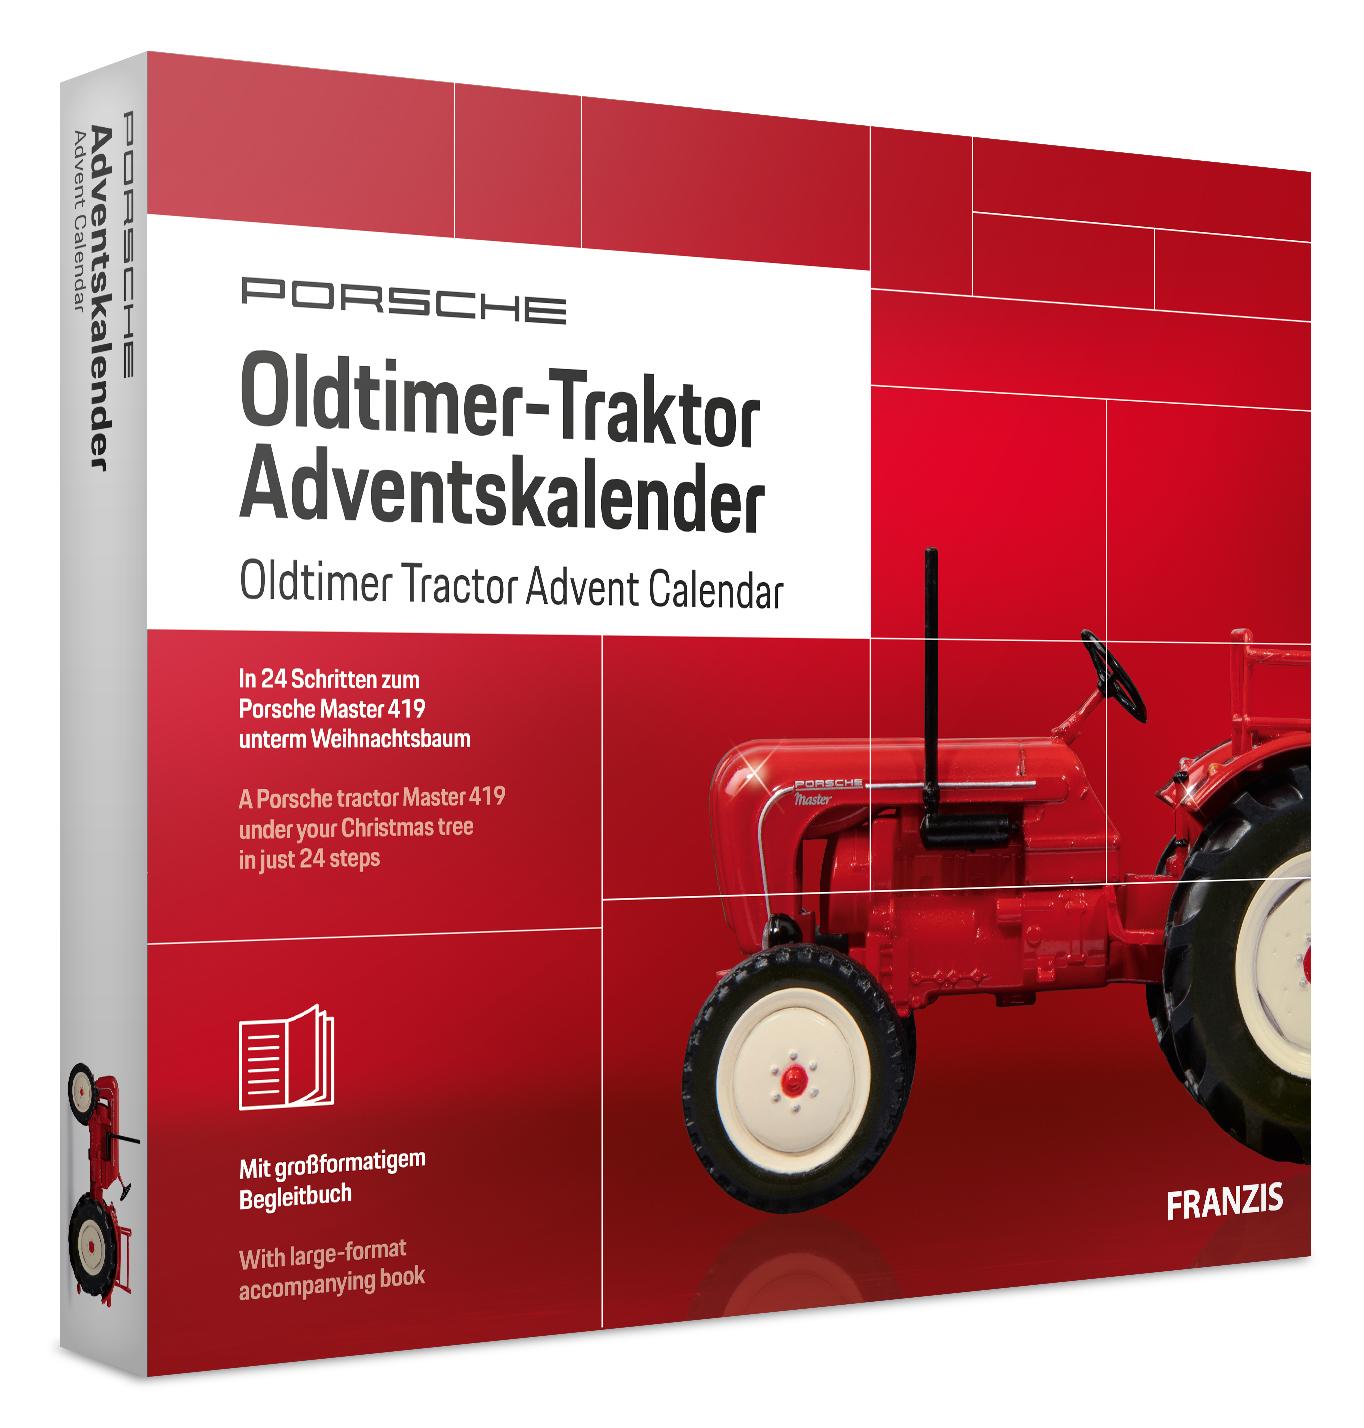 Adventskalender Oldtimer-Traktor